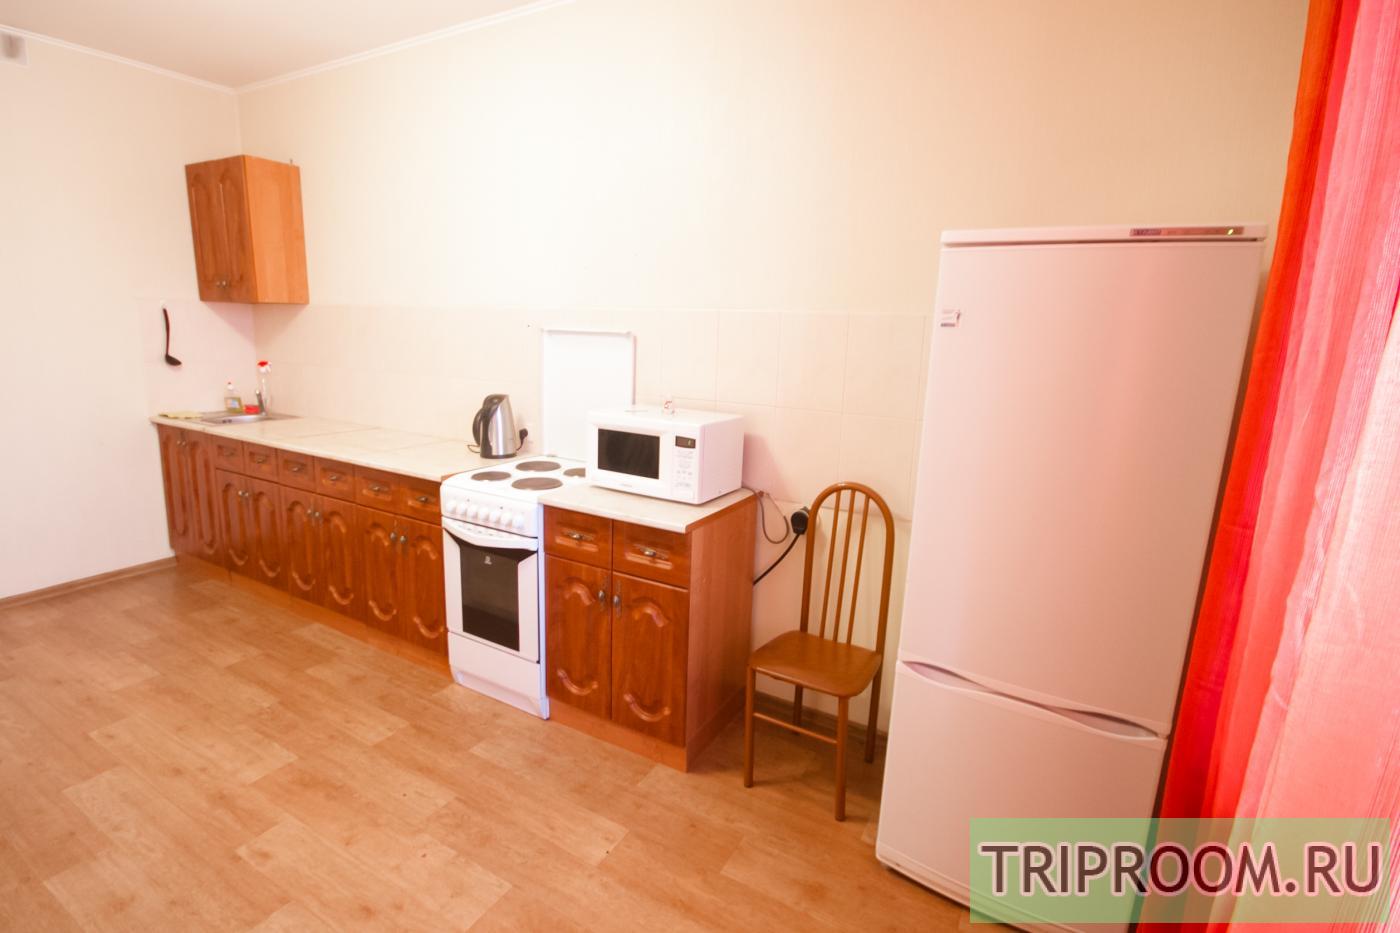 1-комнатная квартира посуточно (вариант № 9382), ул. Галущака улица, фото № 6